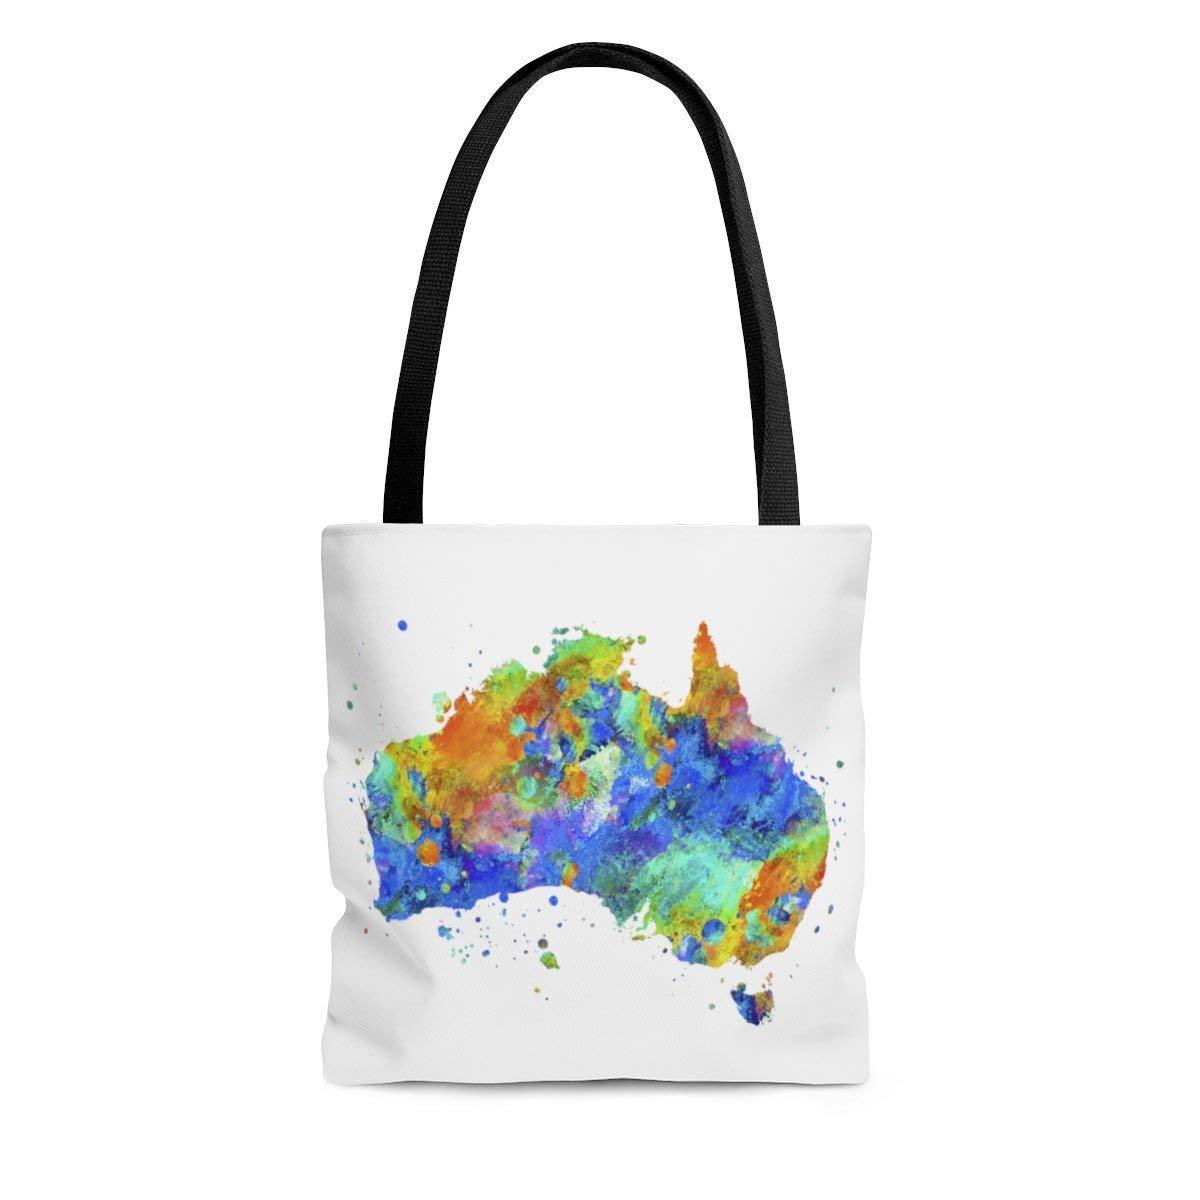 Australia Map Tote Bag Beach Books Free Shipping 2021new shipping free shipping Cheap Bargain Gift Grocery